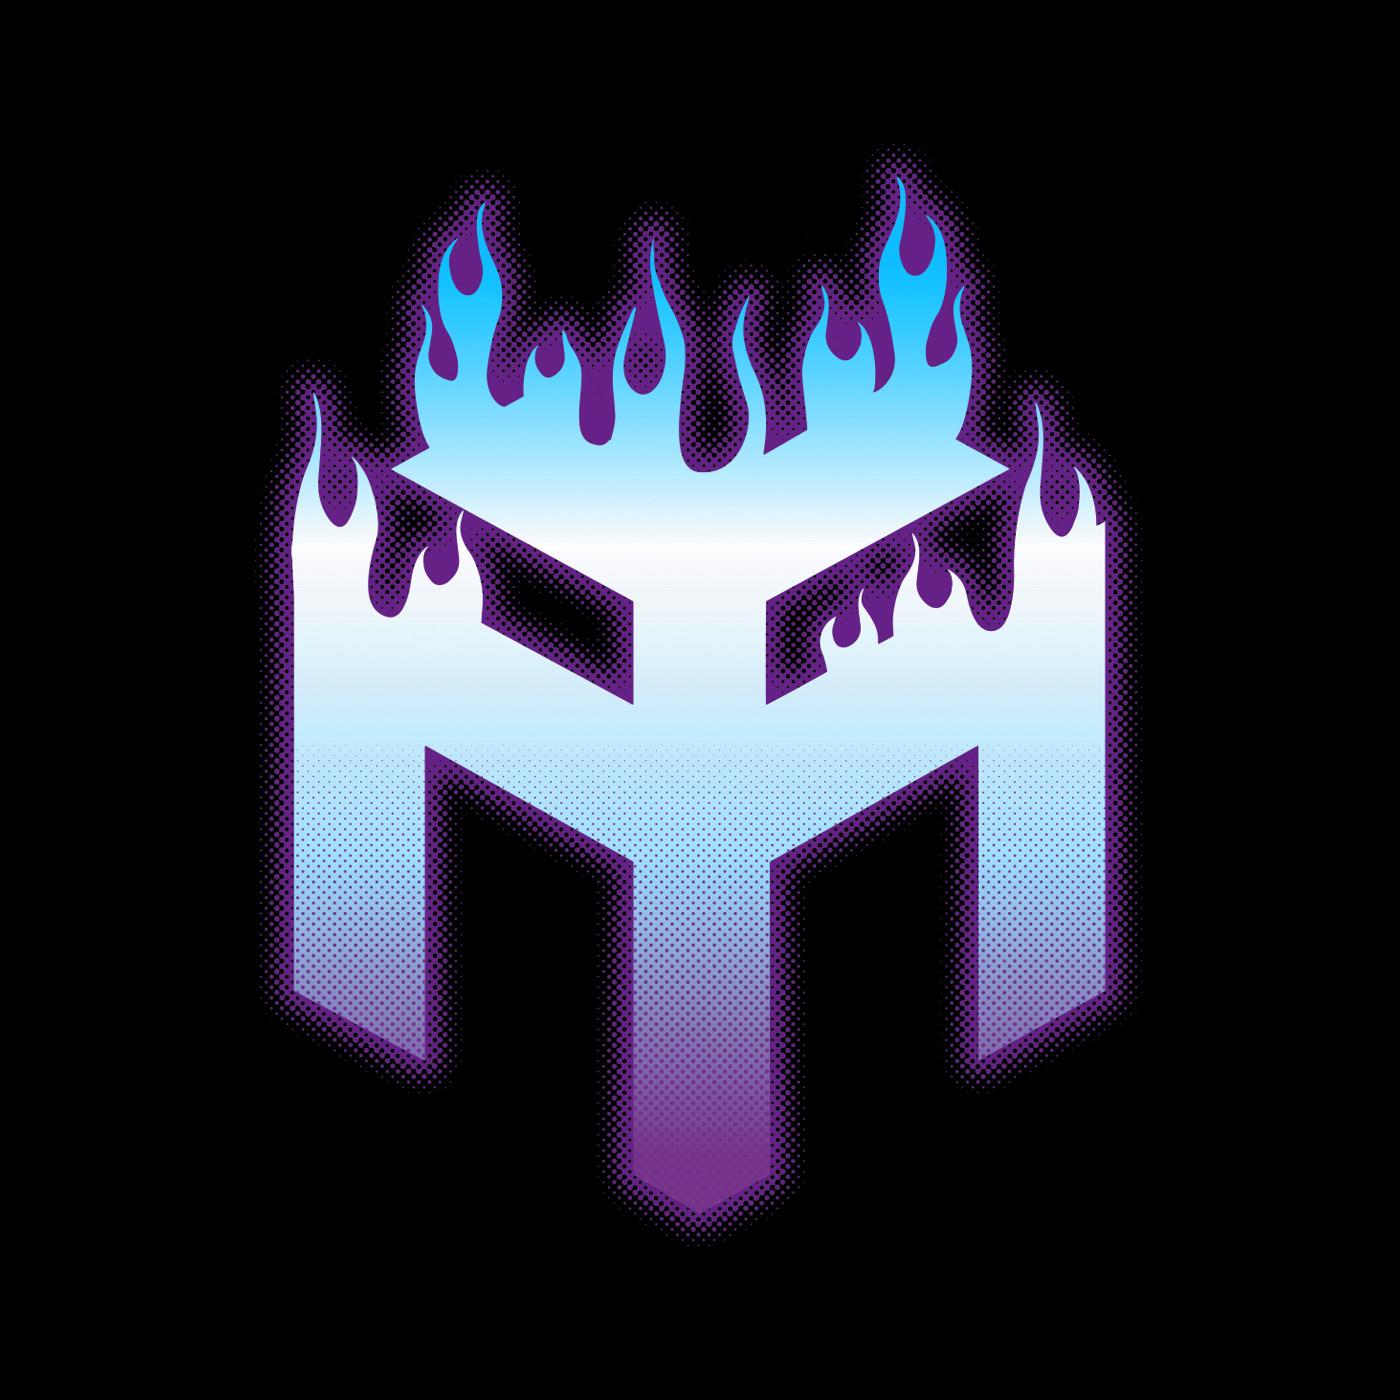 Lil Wayne Young Money Flames Logo